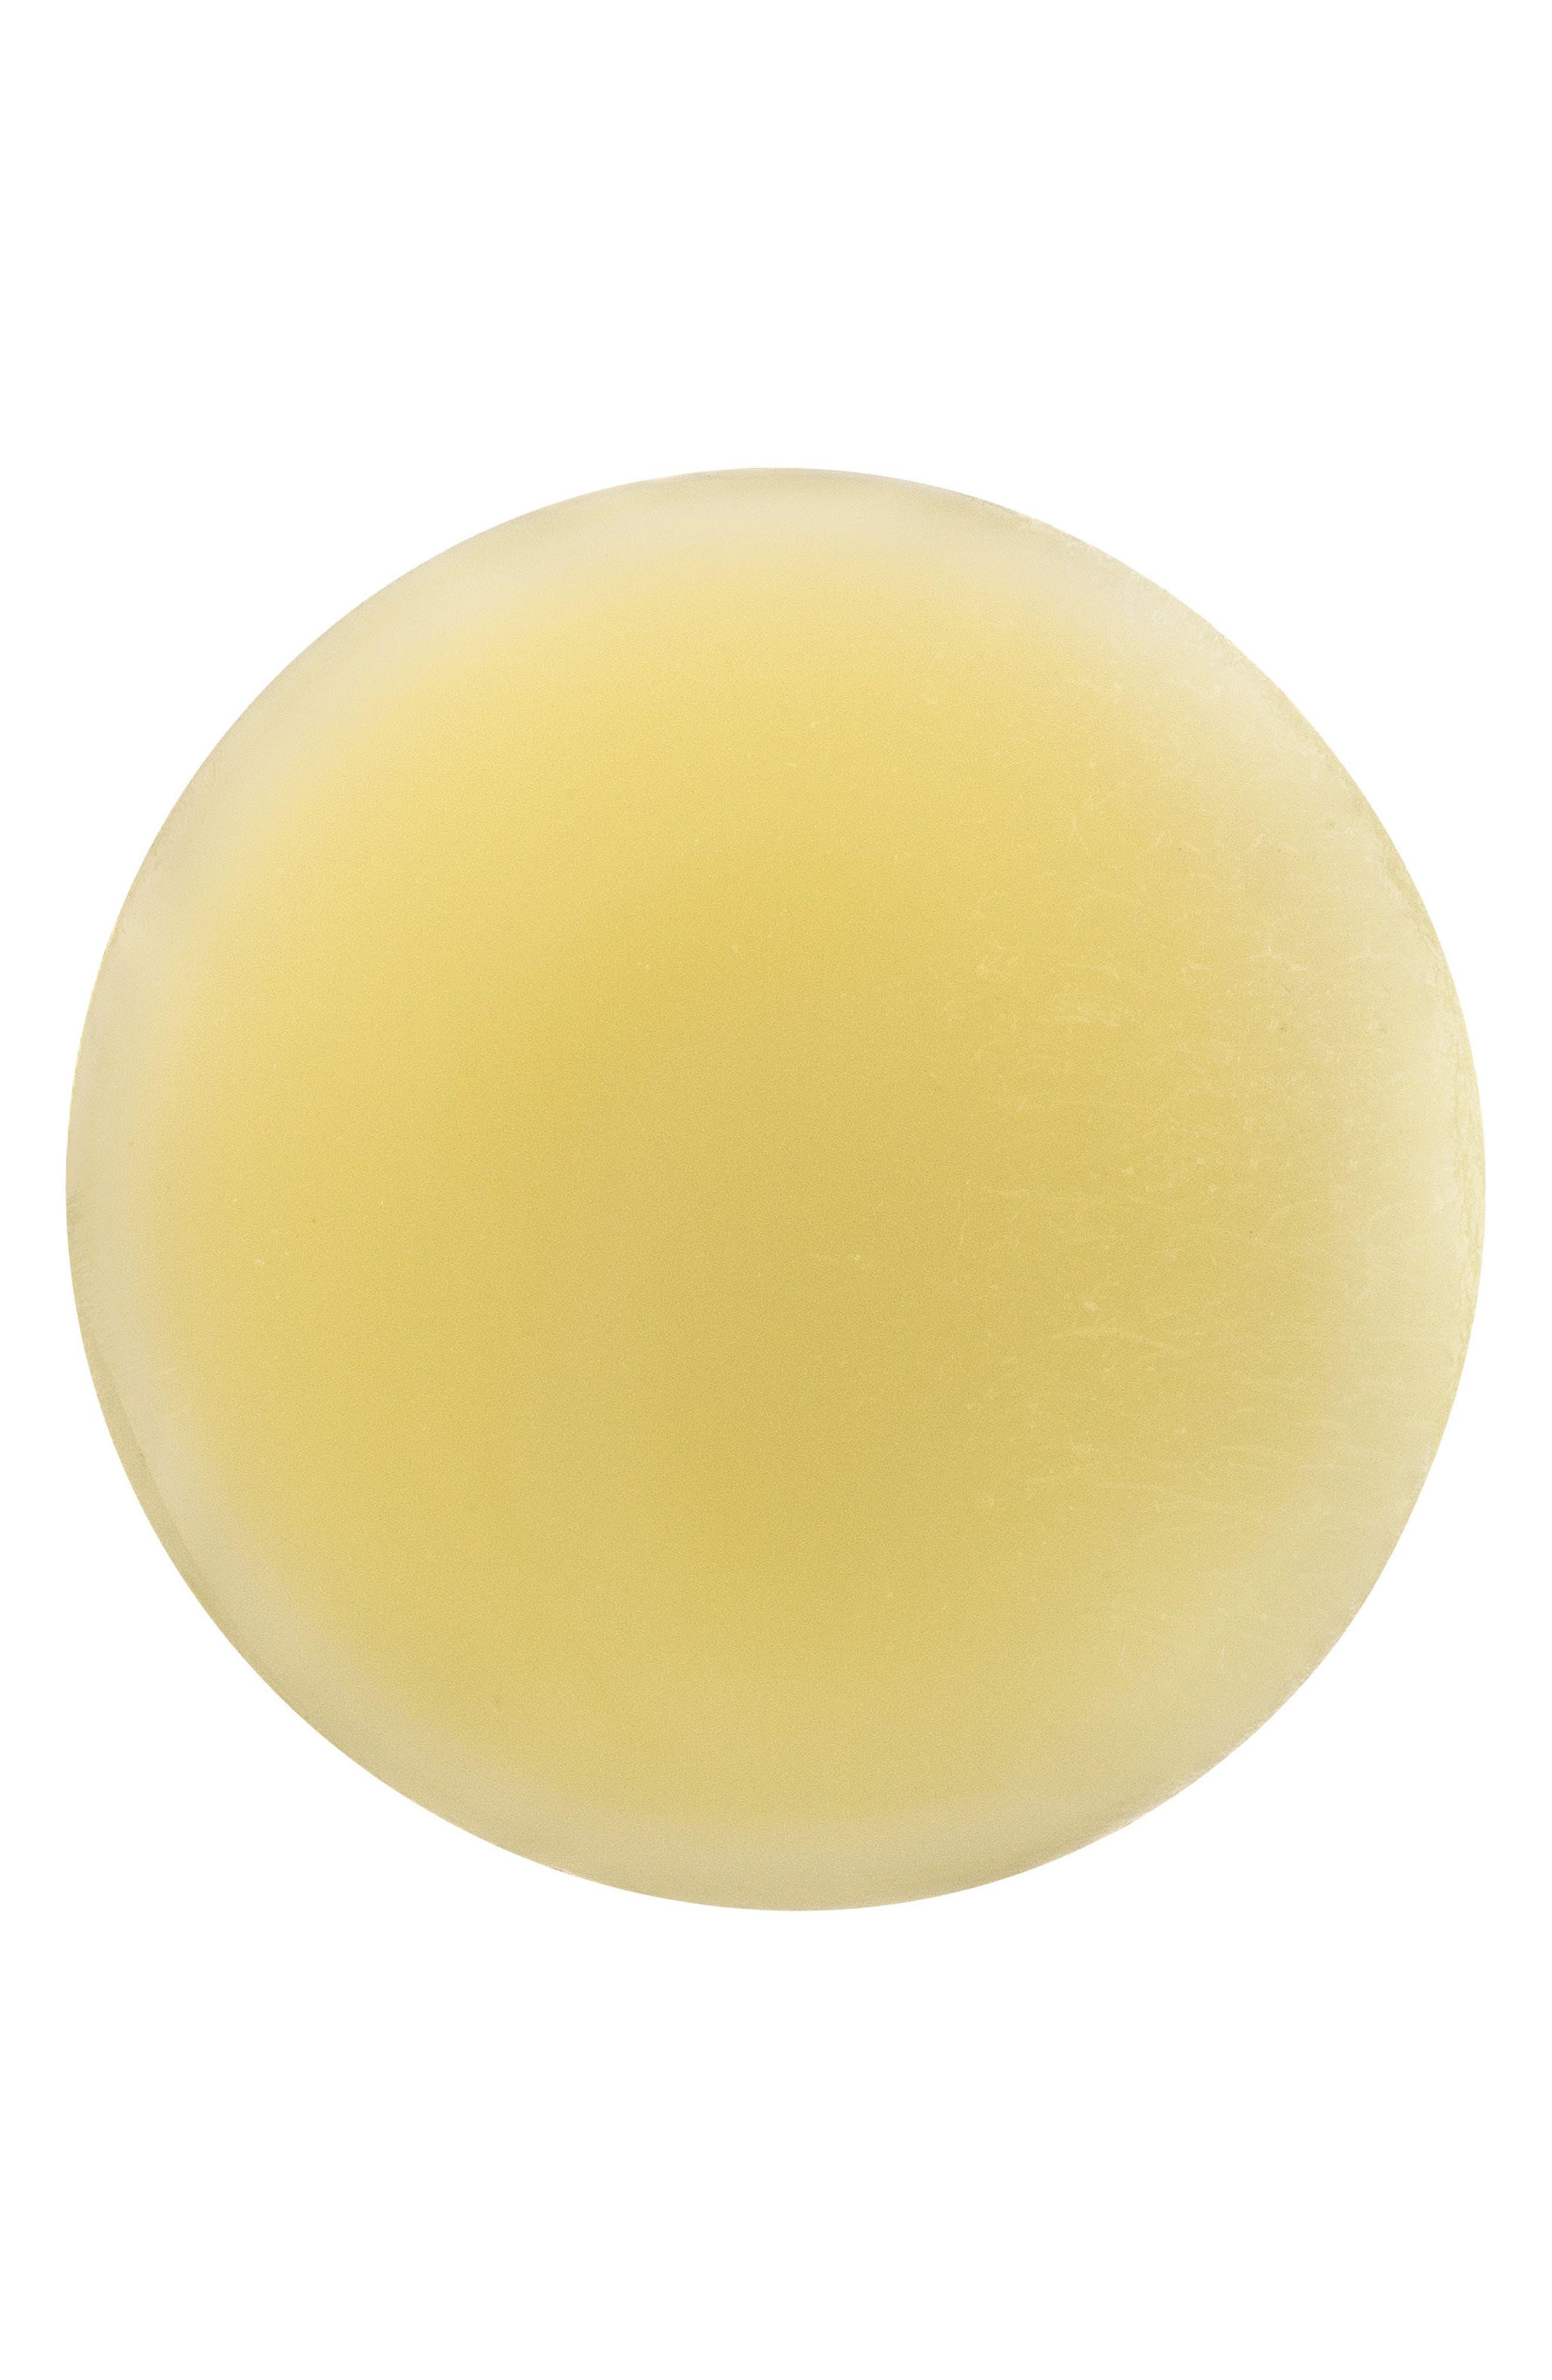 Luxury Lip Balm,                             Alternate thumbnail 2, color,                             No Color